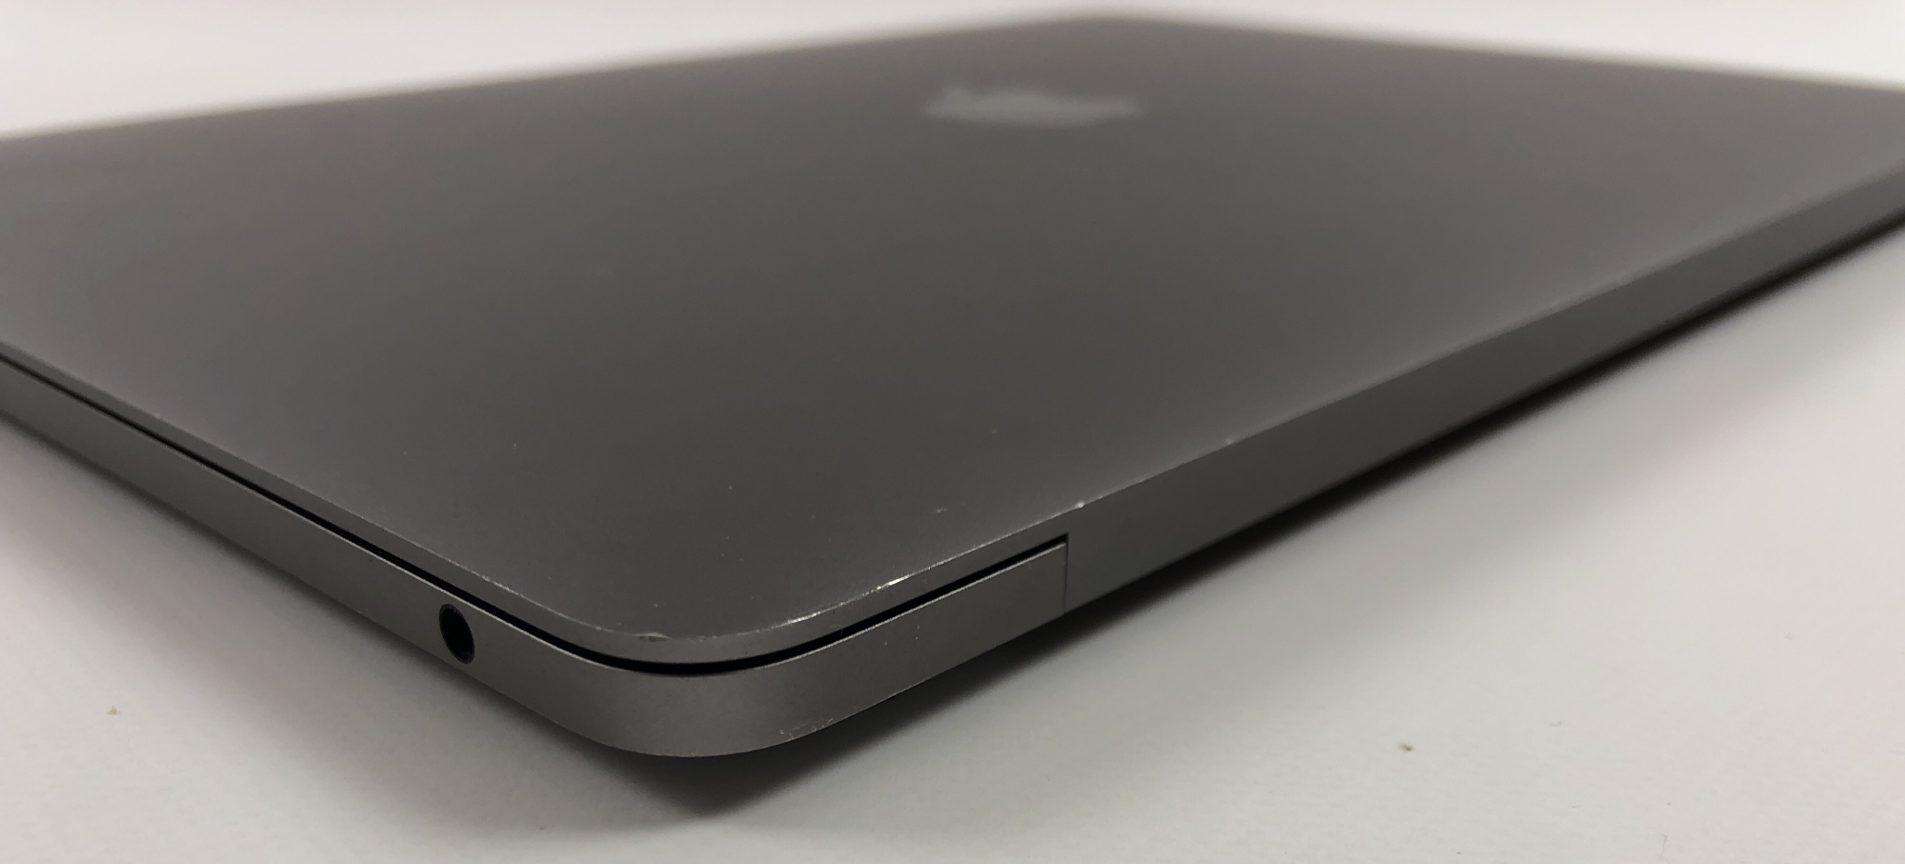 "MacBook Pro 13"" 2TBT Late 2016 (Intel Core i5 2.0 GHz 8 GB RAM 256 GB SSD), Space Gray, Intel Core i5 2.0 GHz, 8 GB RAM, 256 GB SSD, bild 3"